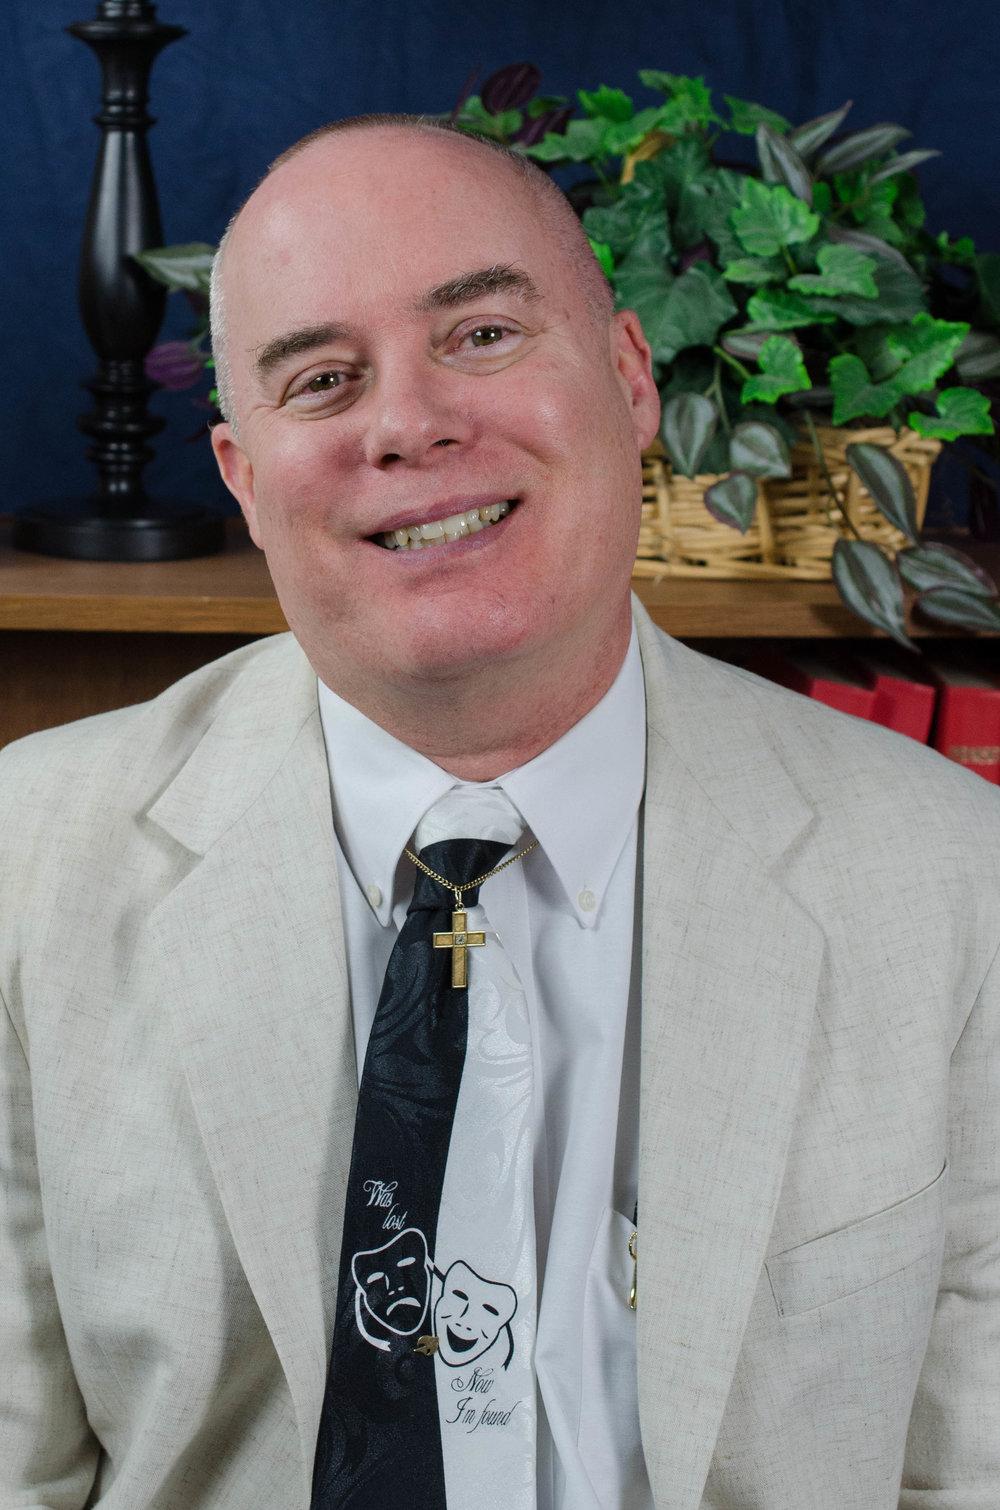 Rev. Dr. Robert Prescott-Ezickson